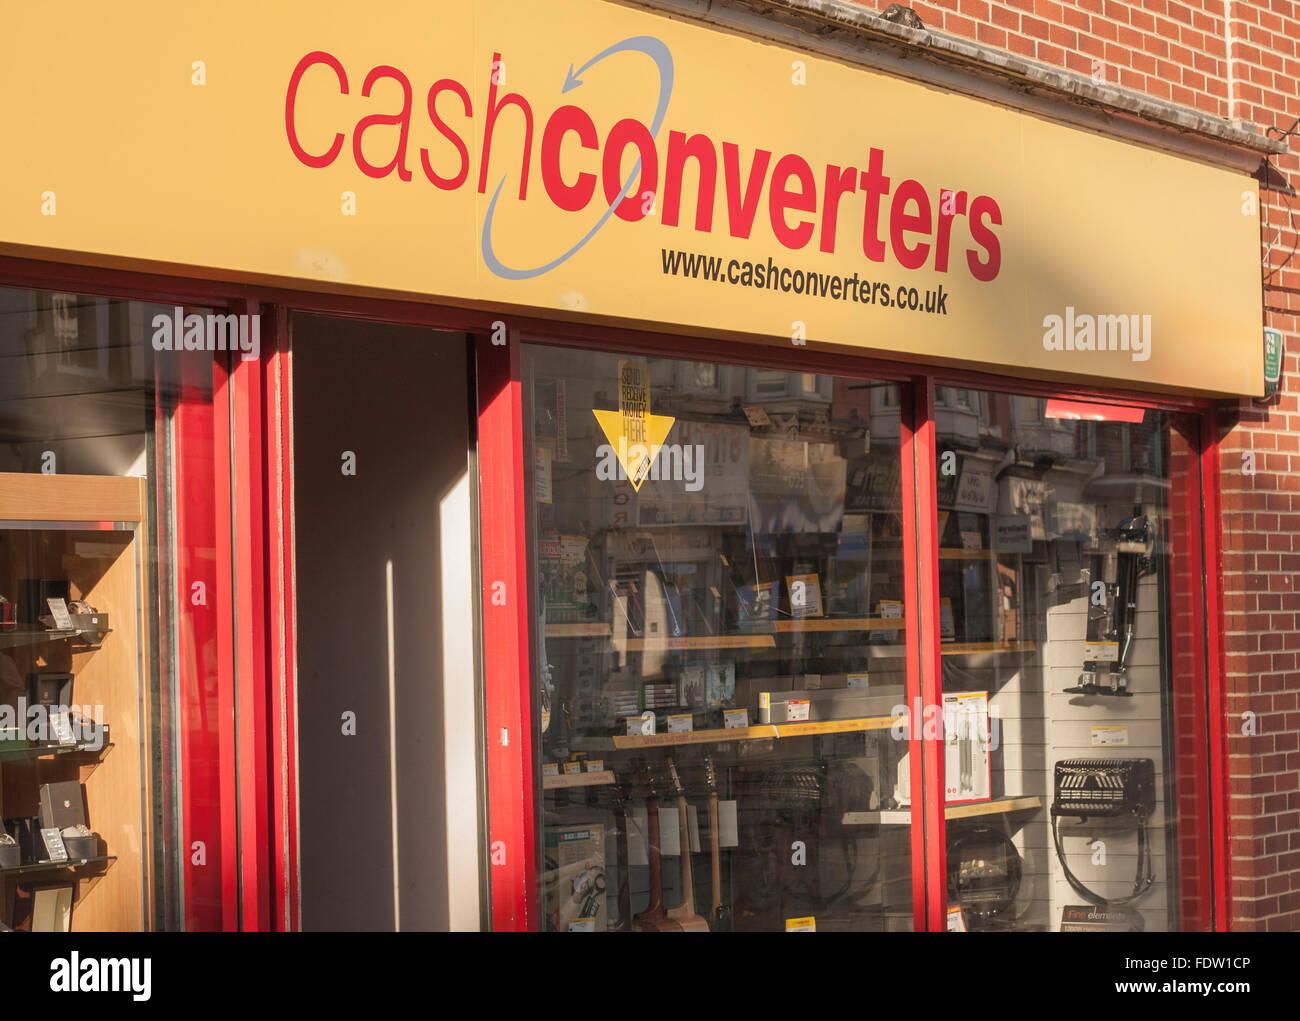 100 instant cash loan image 6